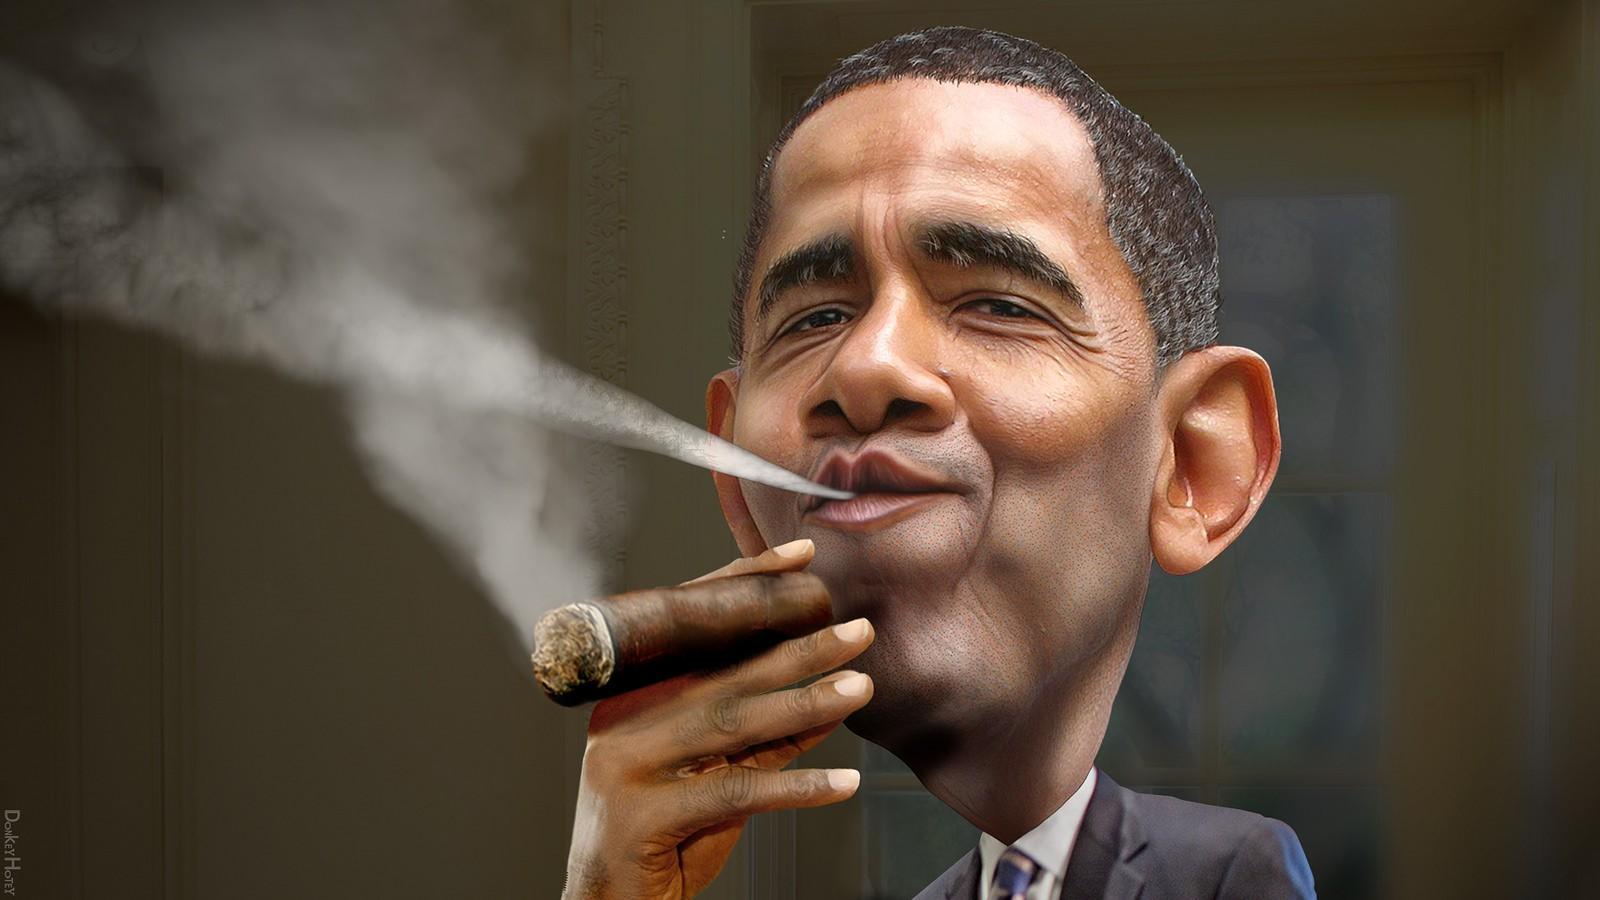 "Caricature of Barack Obama | © <a href=""https://www.flickr.com/photos/donkeyhotey/16018574316/"">  DonkeyHotey  / Flickr </a>"